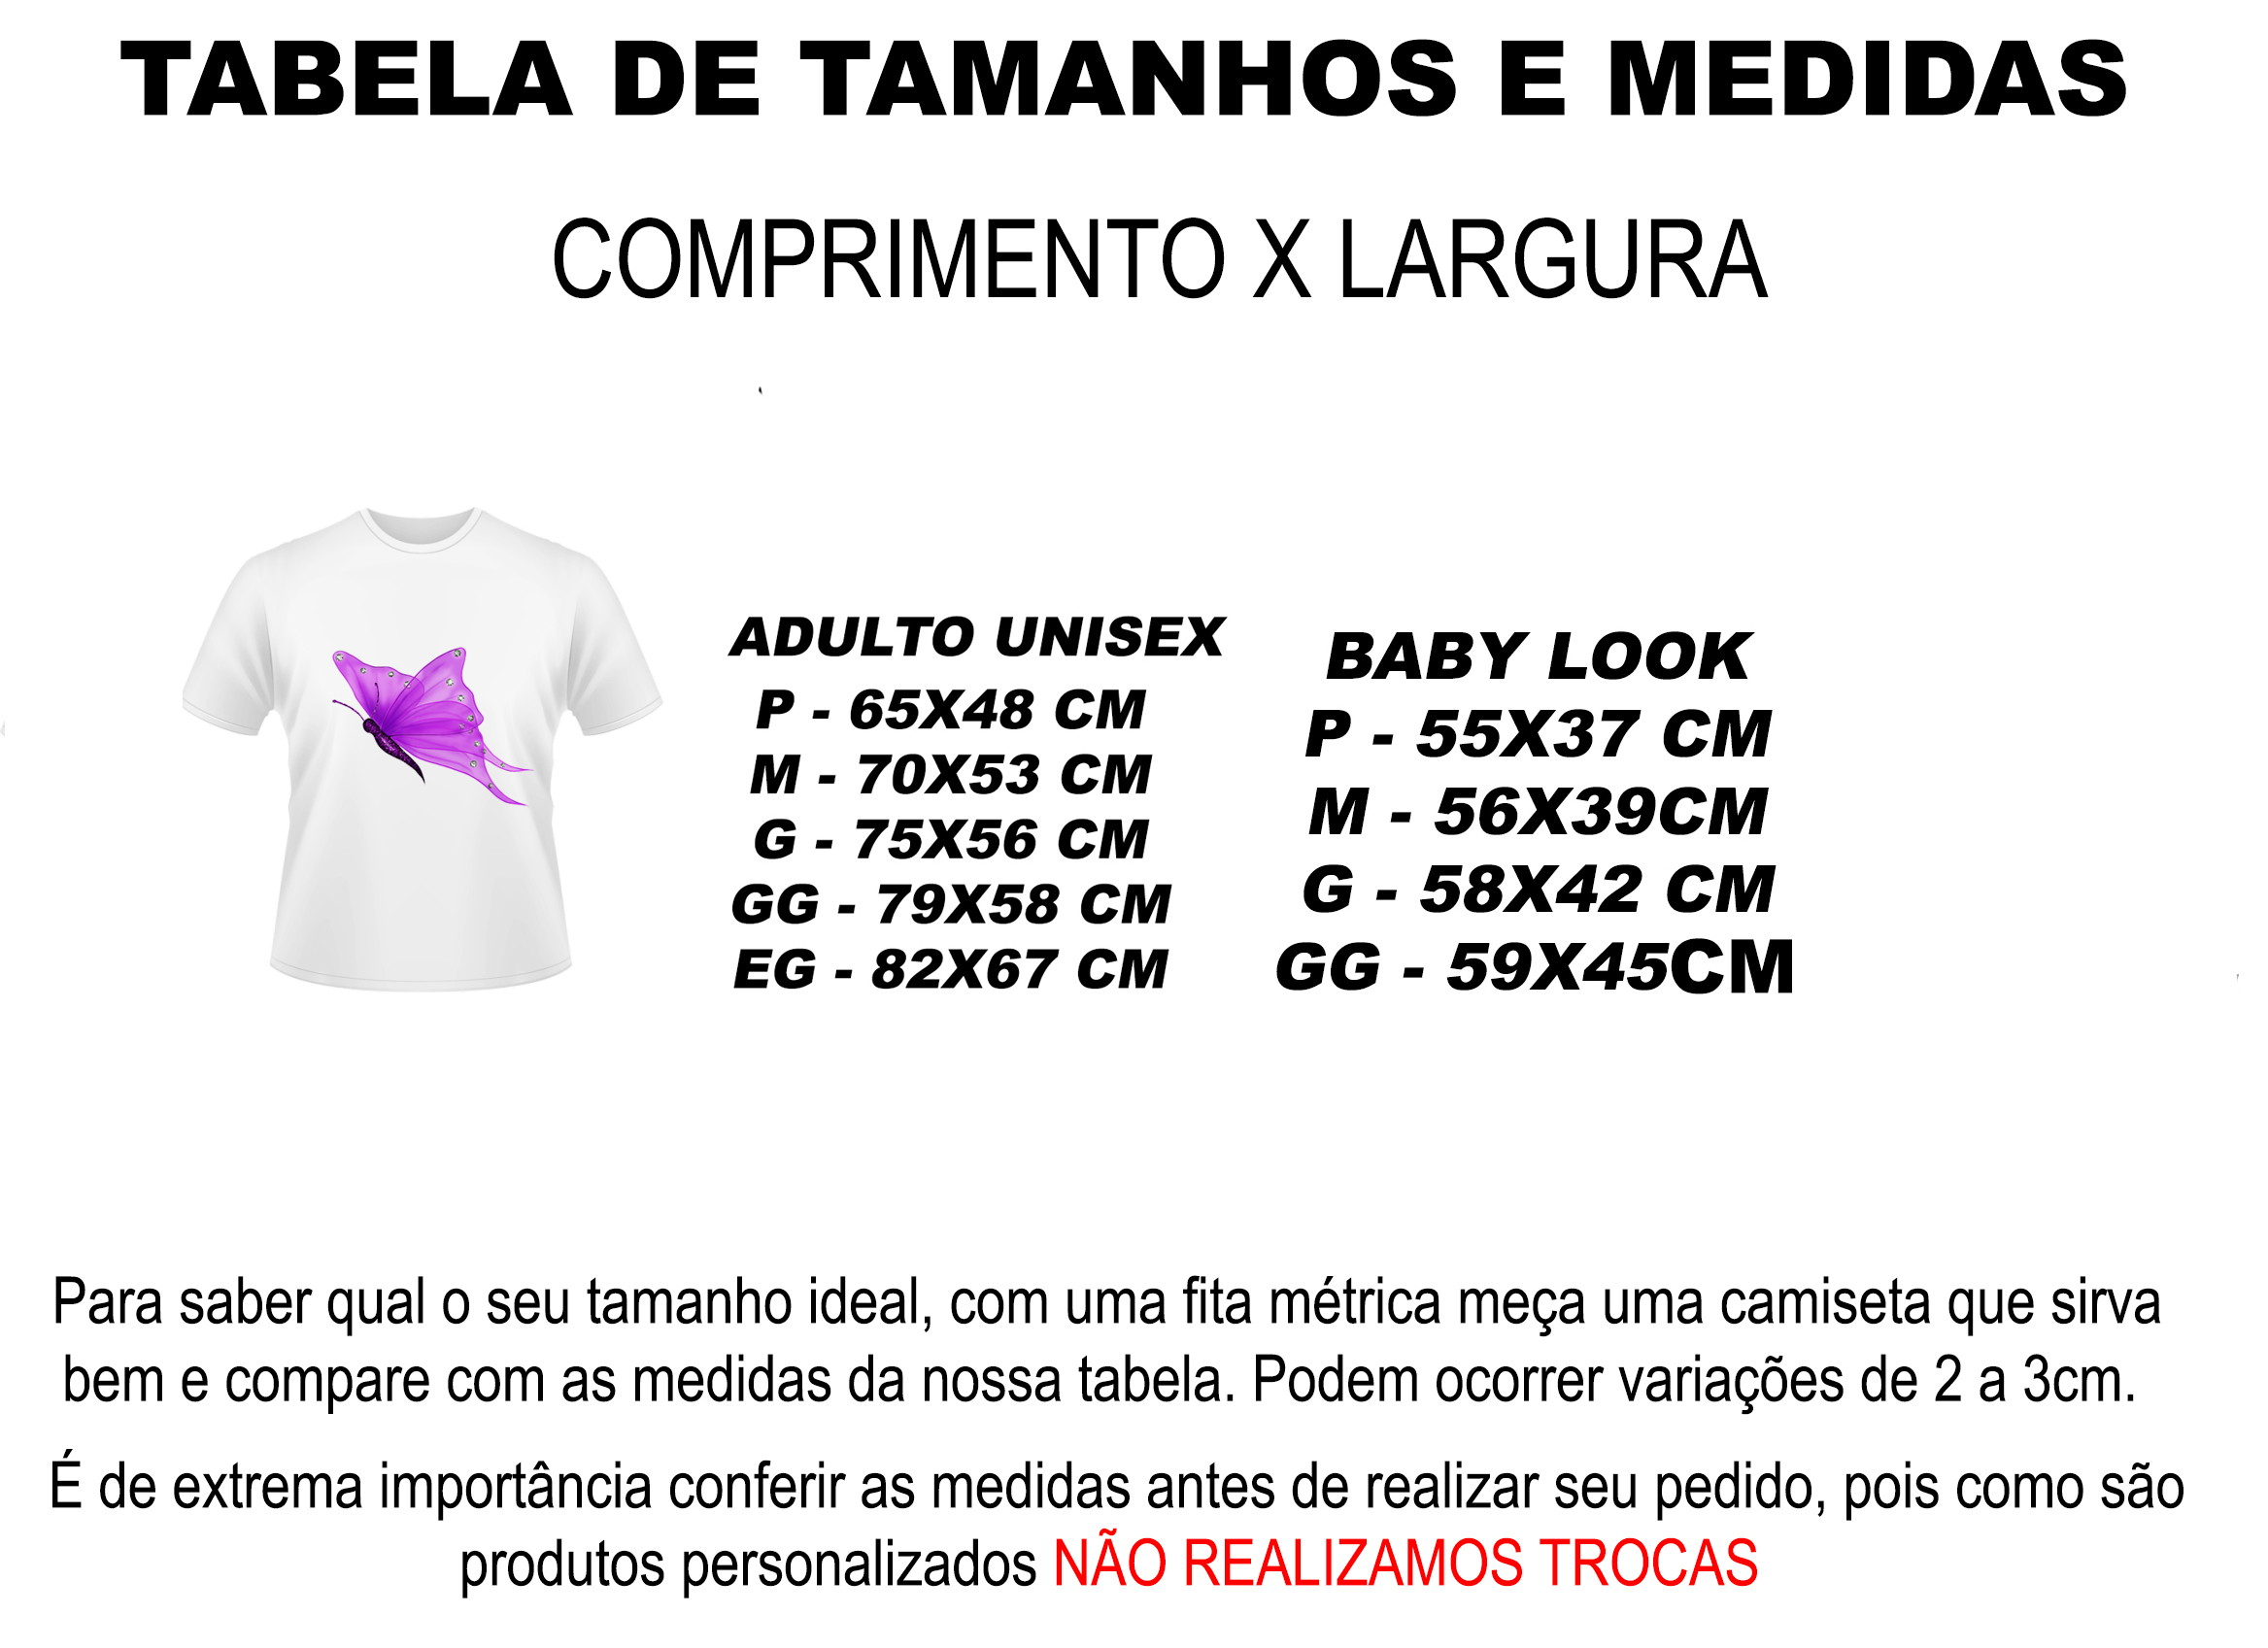 1379a9f07f Kit Camiseta Casal Love Tradicional Ou Baby Look - 02 peças no Elo7 ...